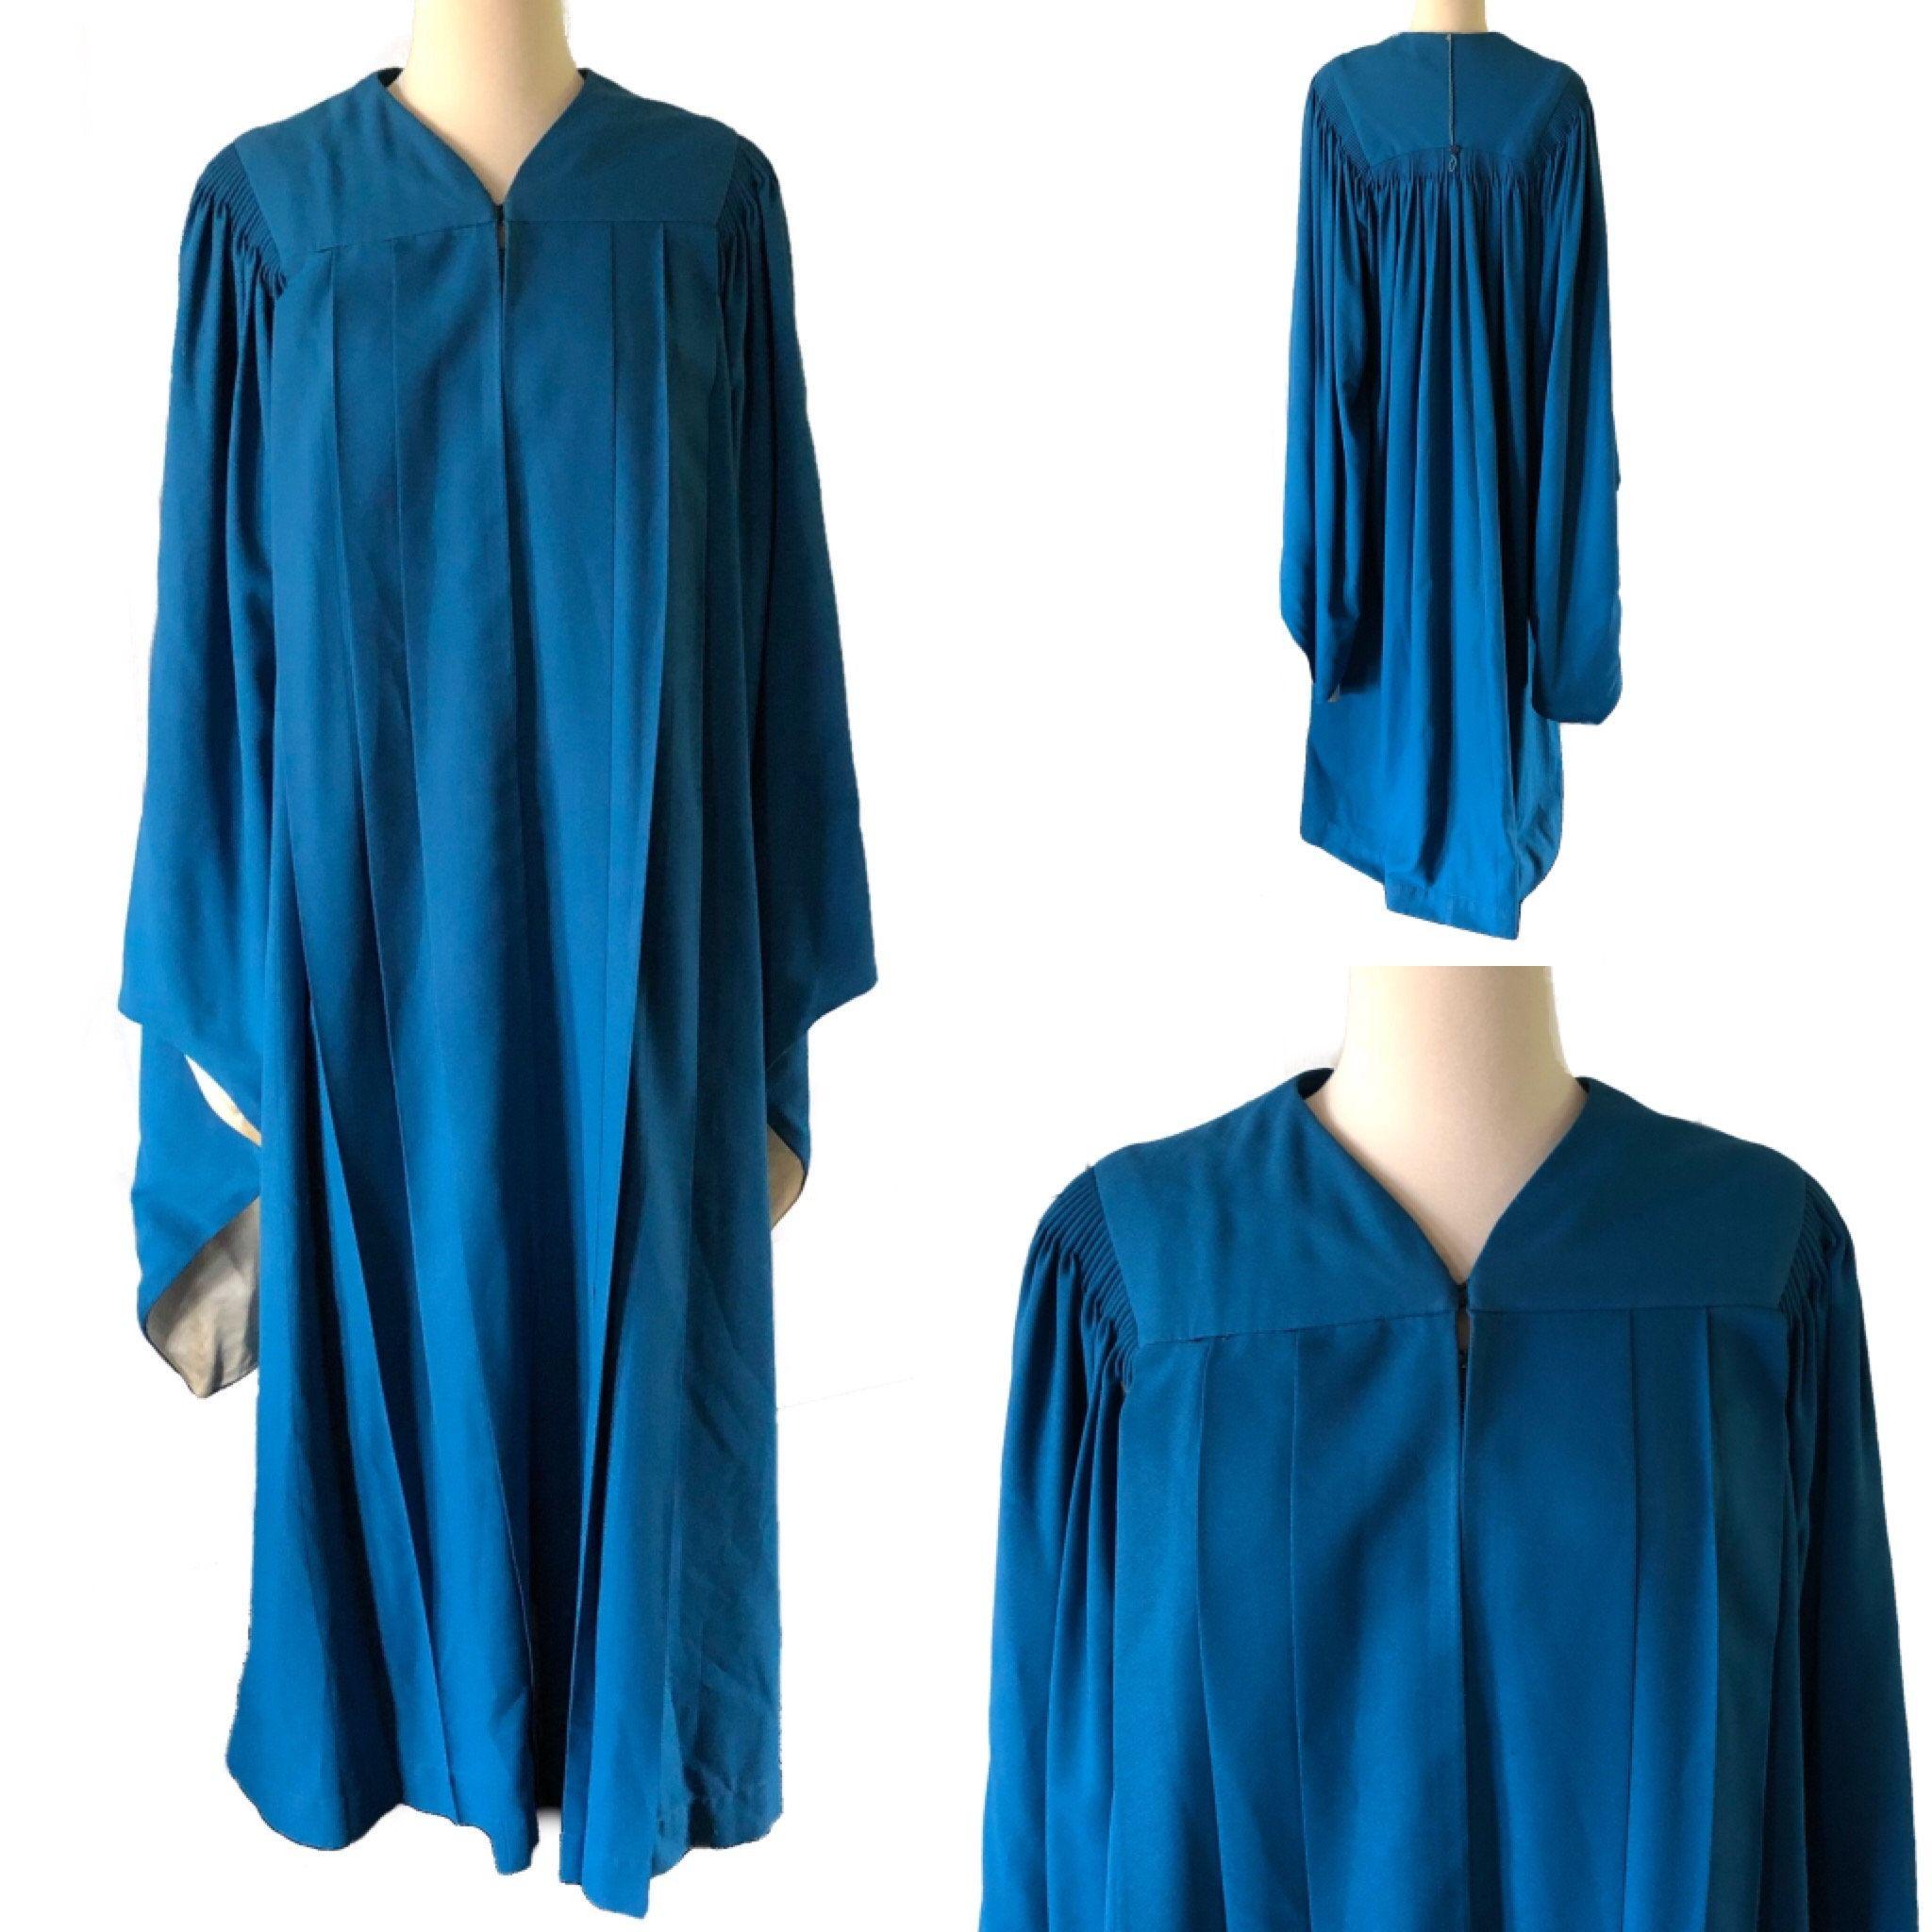 Vintage Graduation Gown Choir Robe Blue Angel Sleeves Etsy Graduation Gown Vintage Graduation Fashion